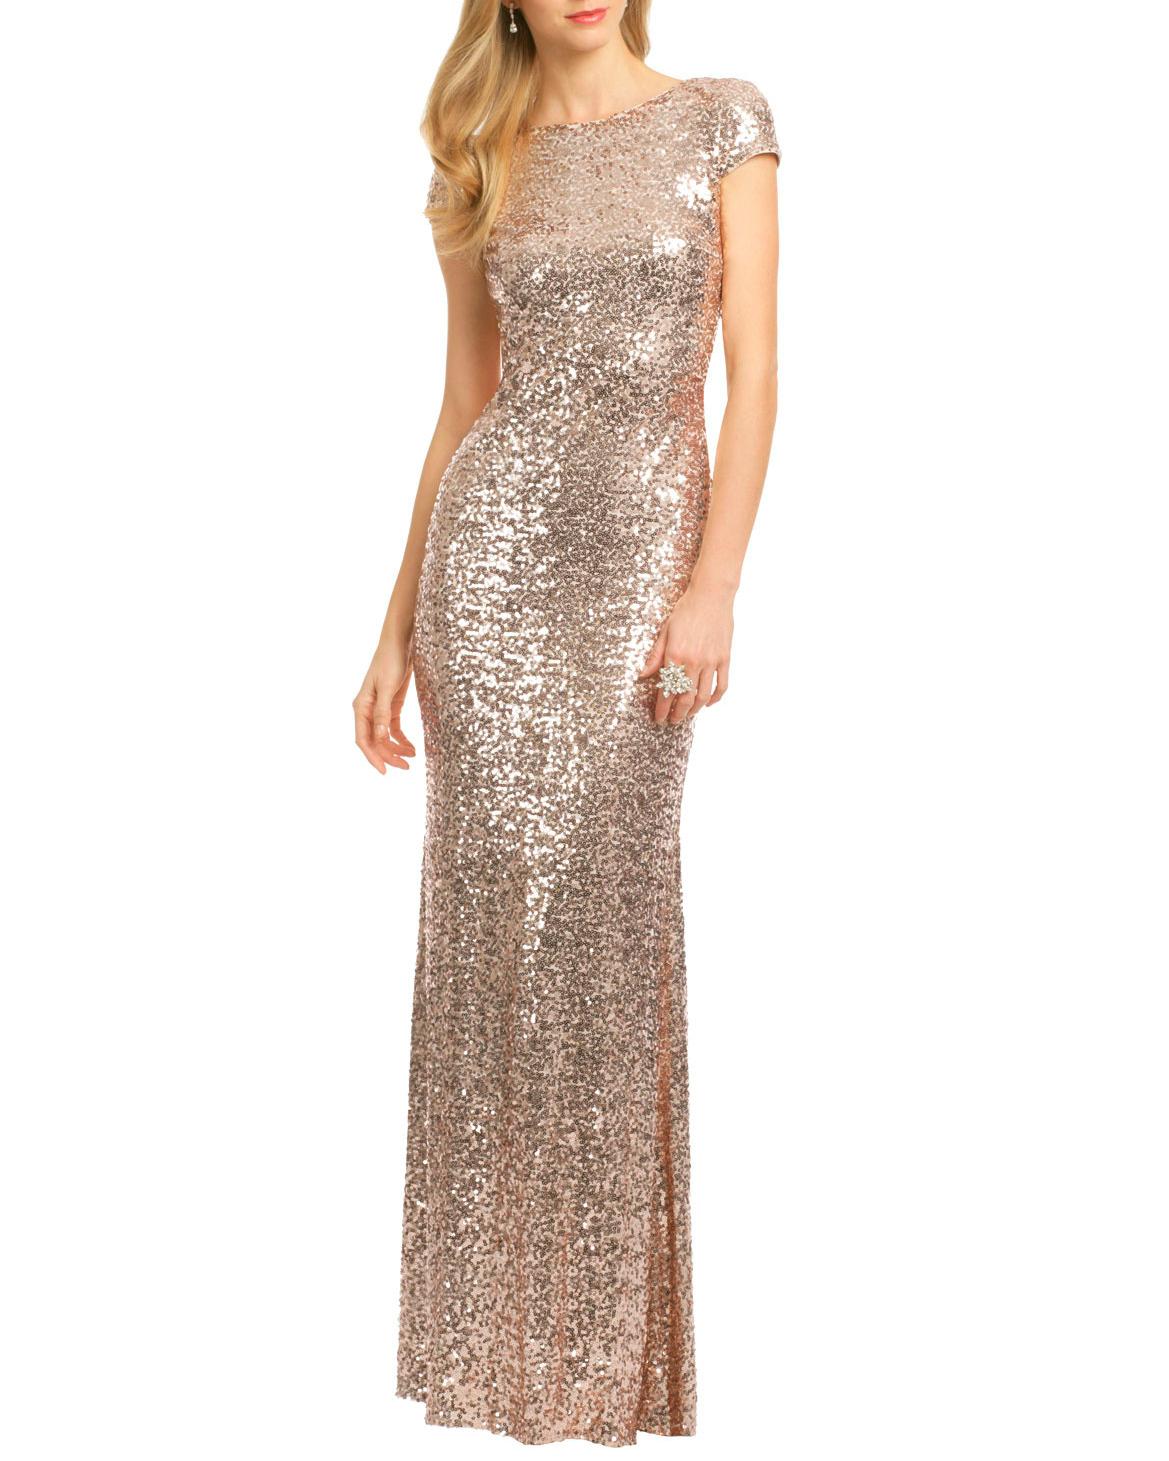 engagement-party-dresses-badgley-mischka-1215.jpg